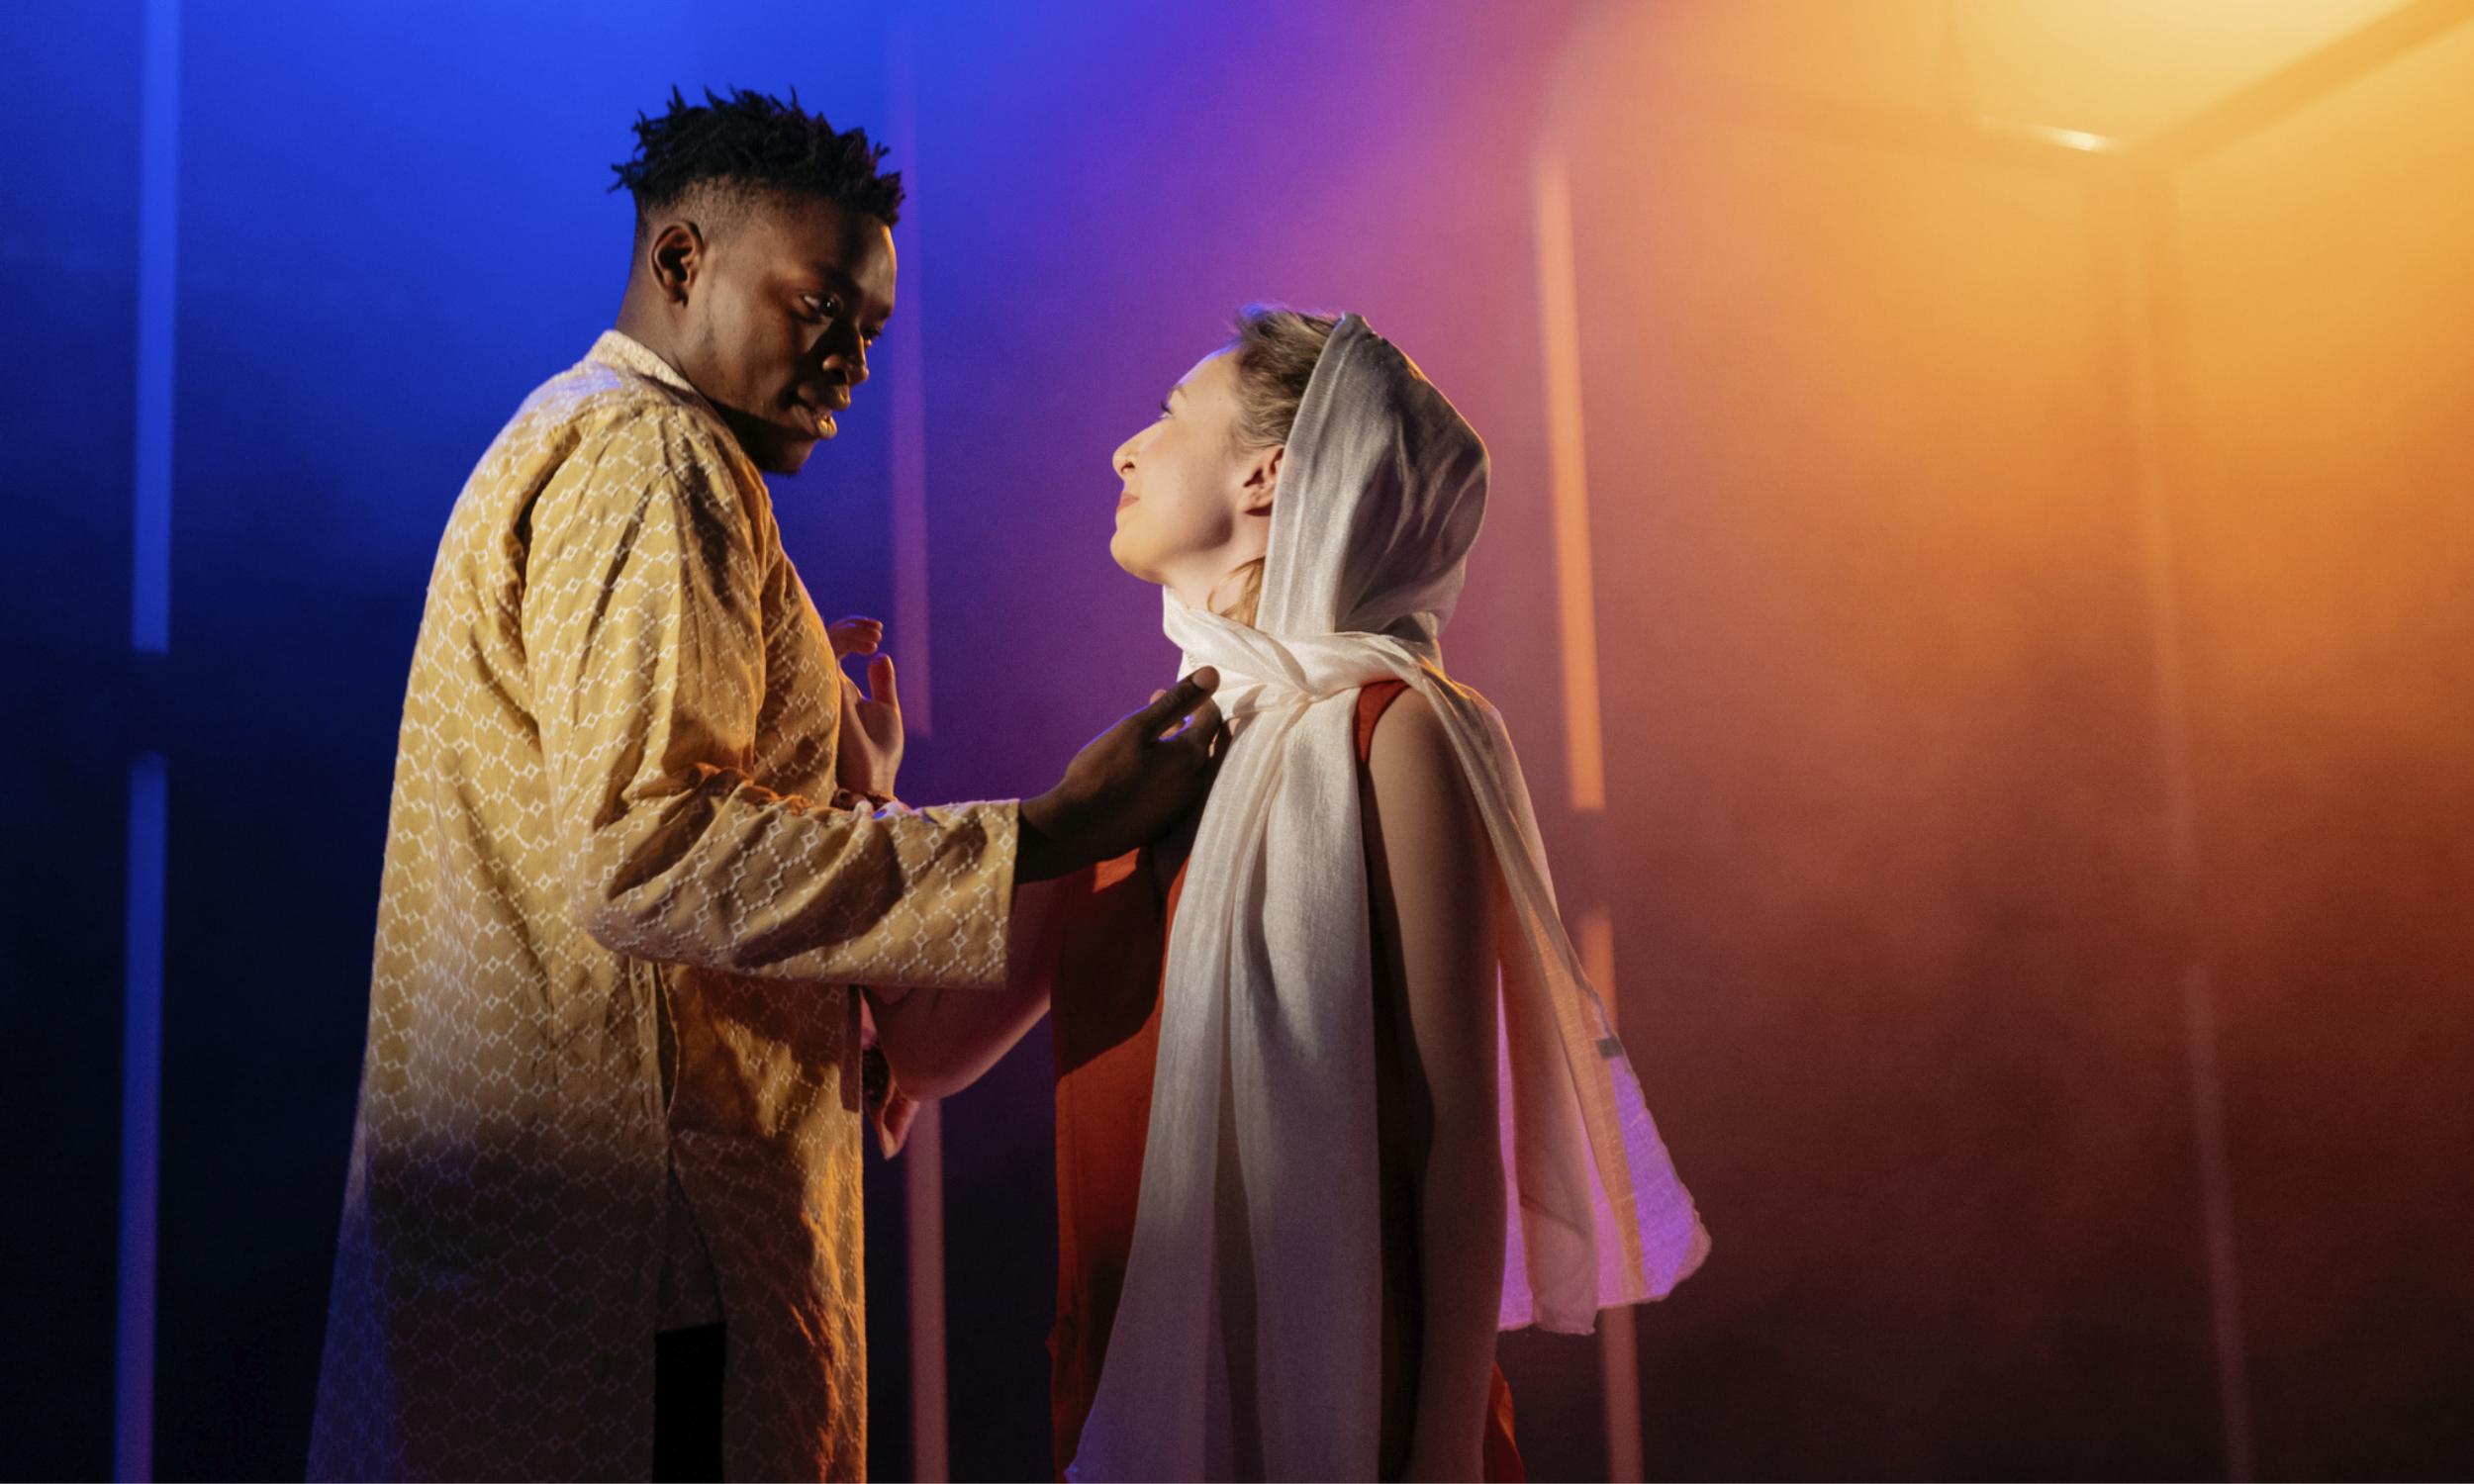 Victor Oshin (Othello) reaches towards Kitty Archer (Desdemona) as they look into each other's eyes. From ETT's Othello © Helen Murray.